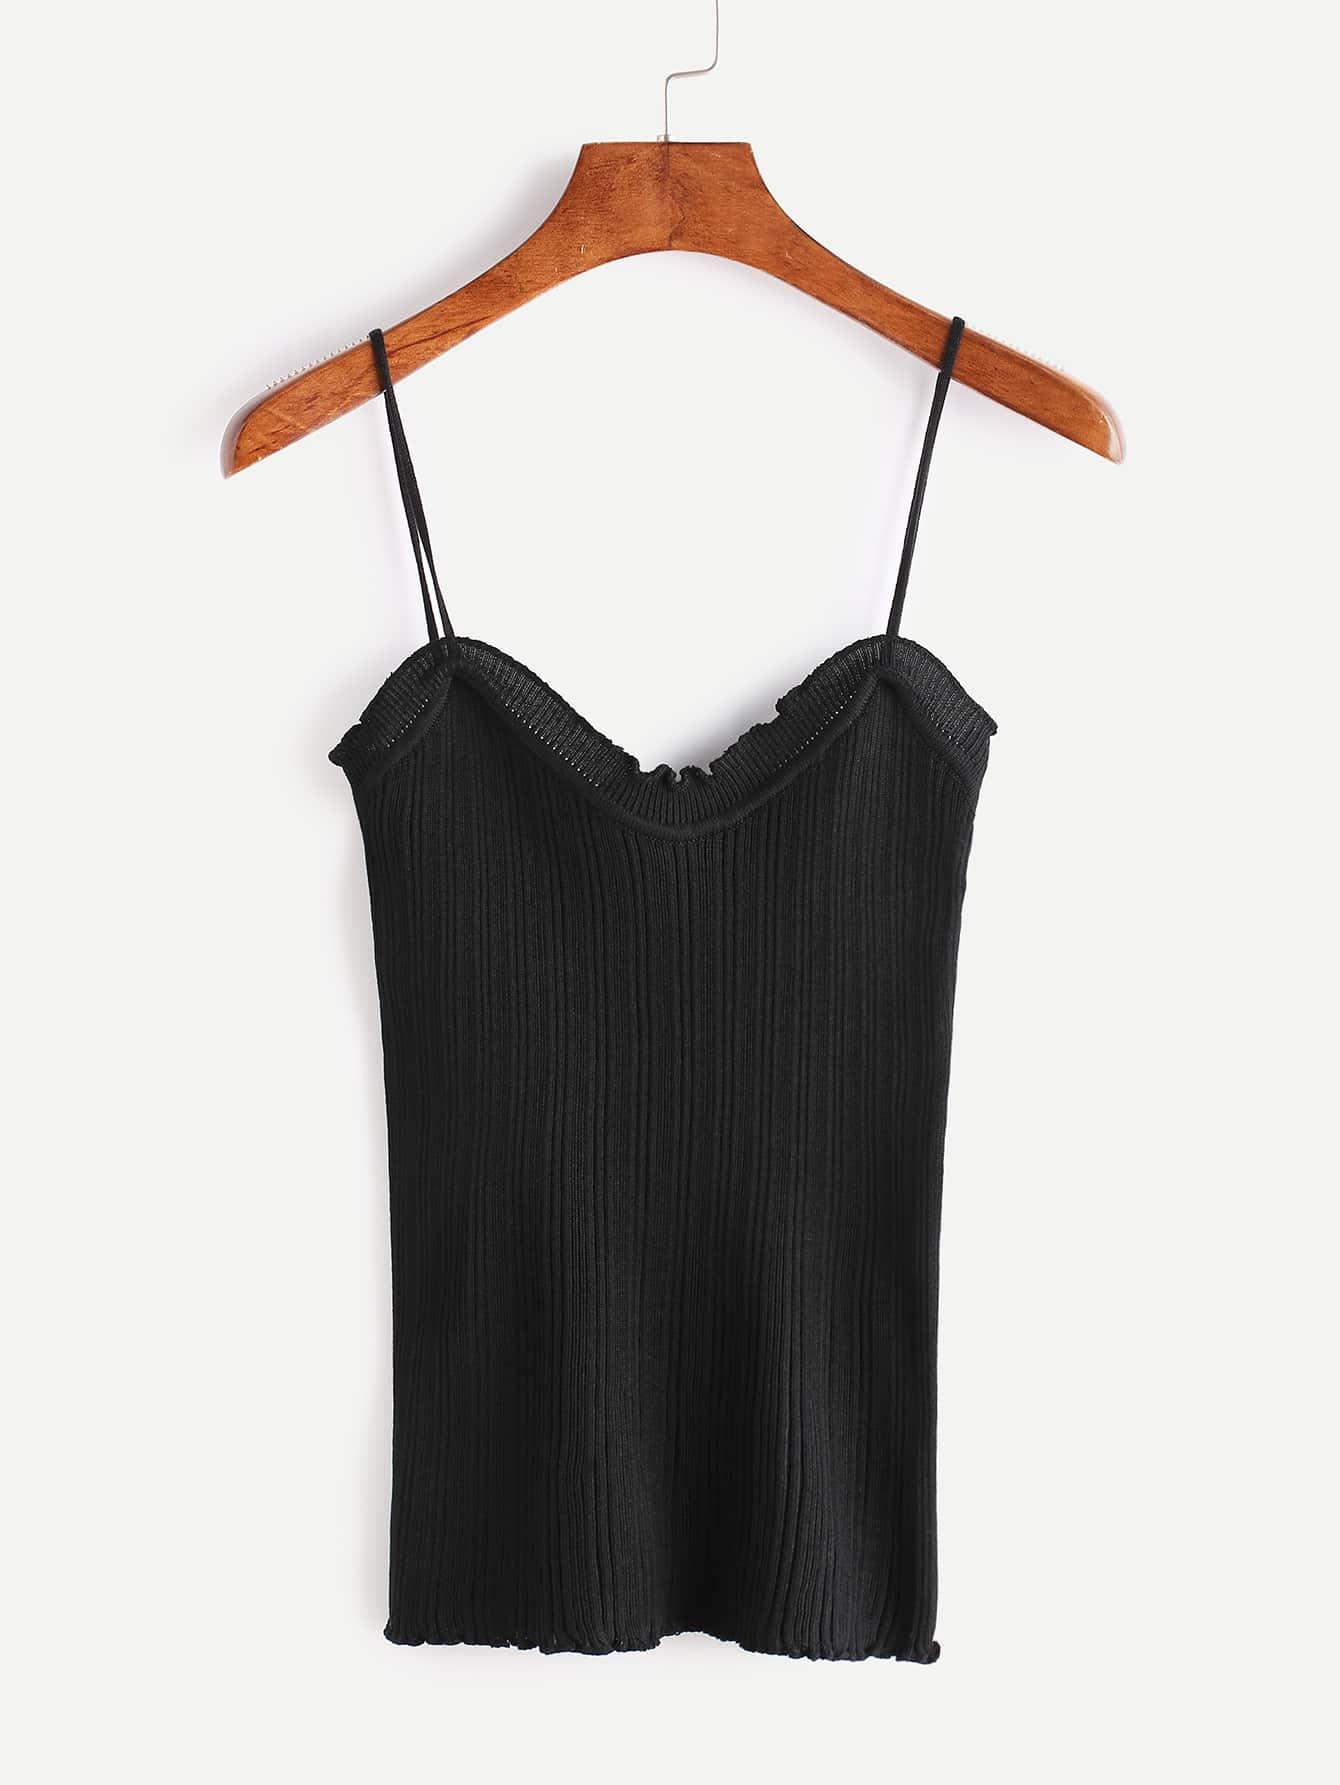 Black Ribbed Ruffle Cami Top vest170316103